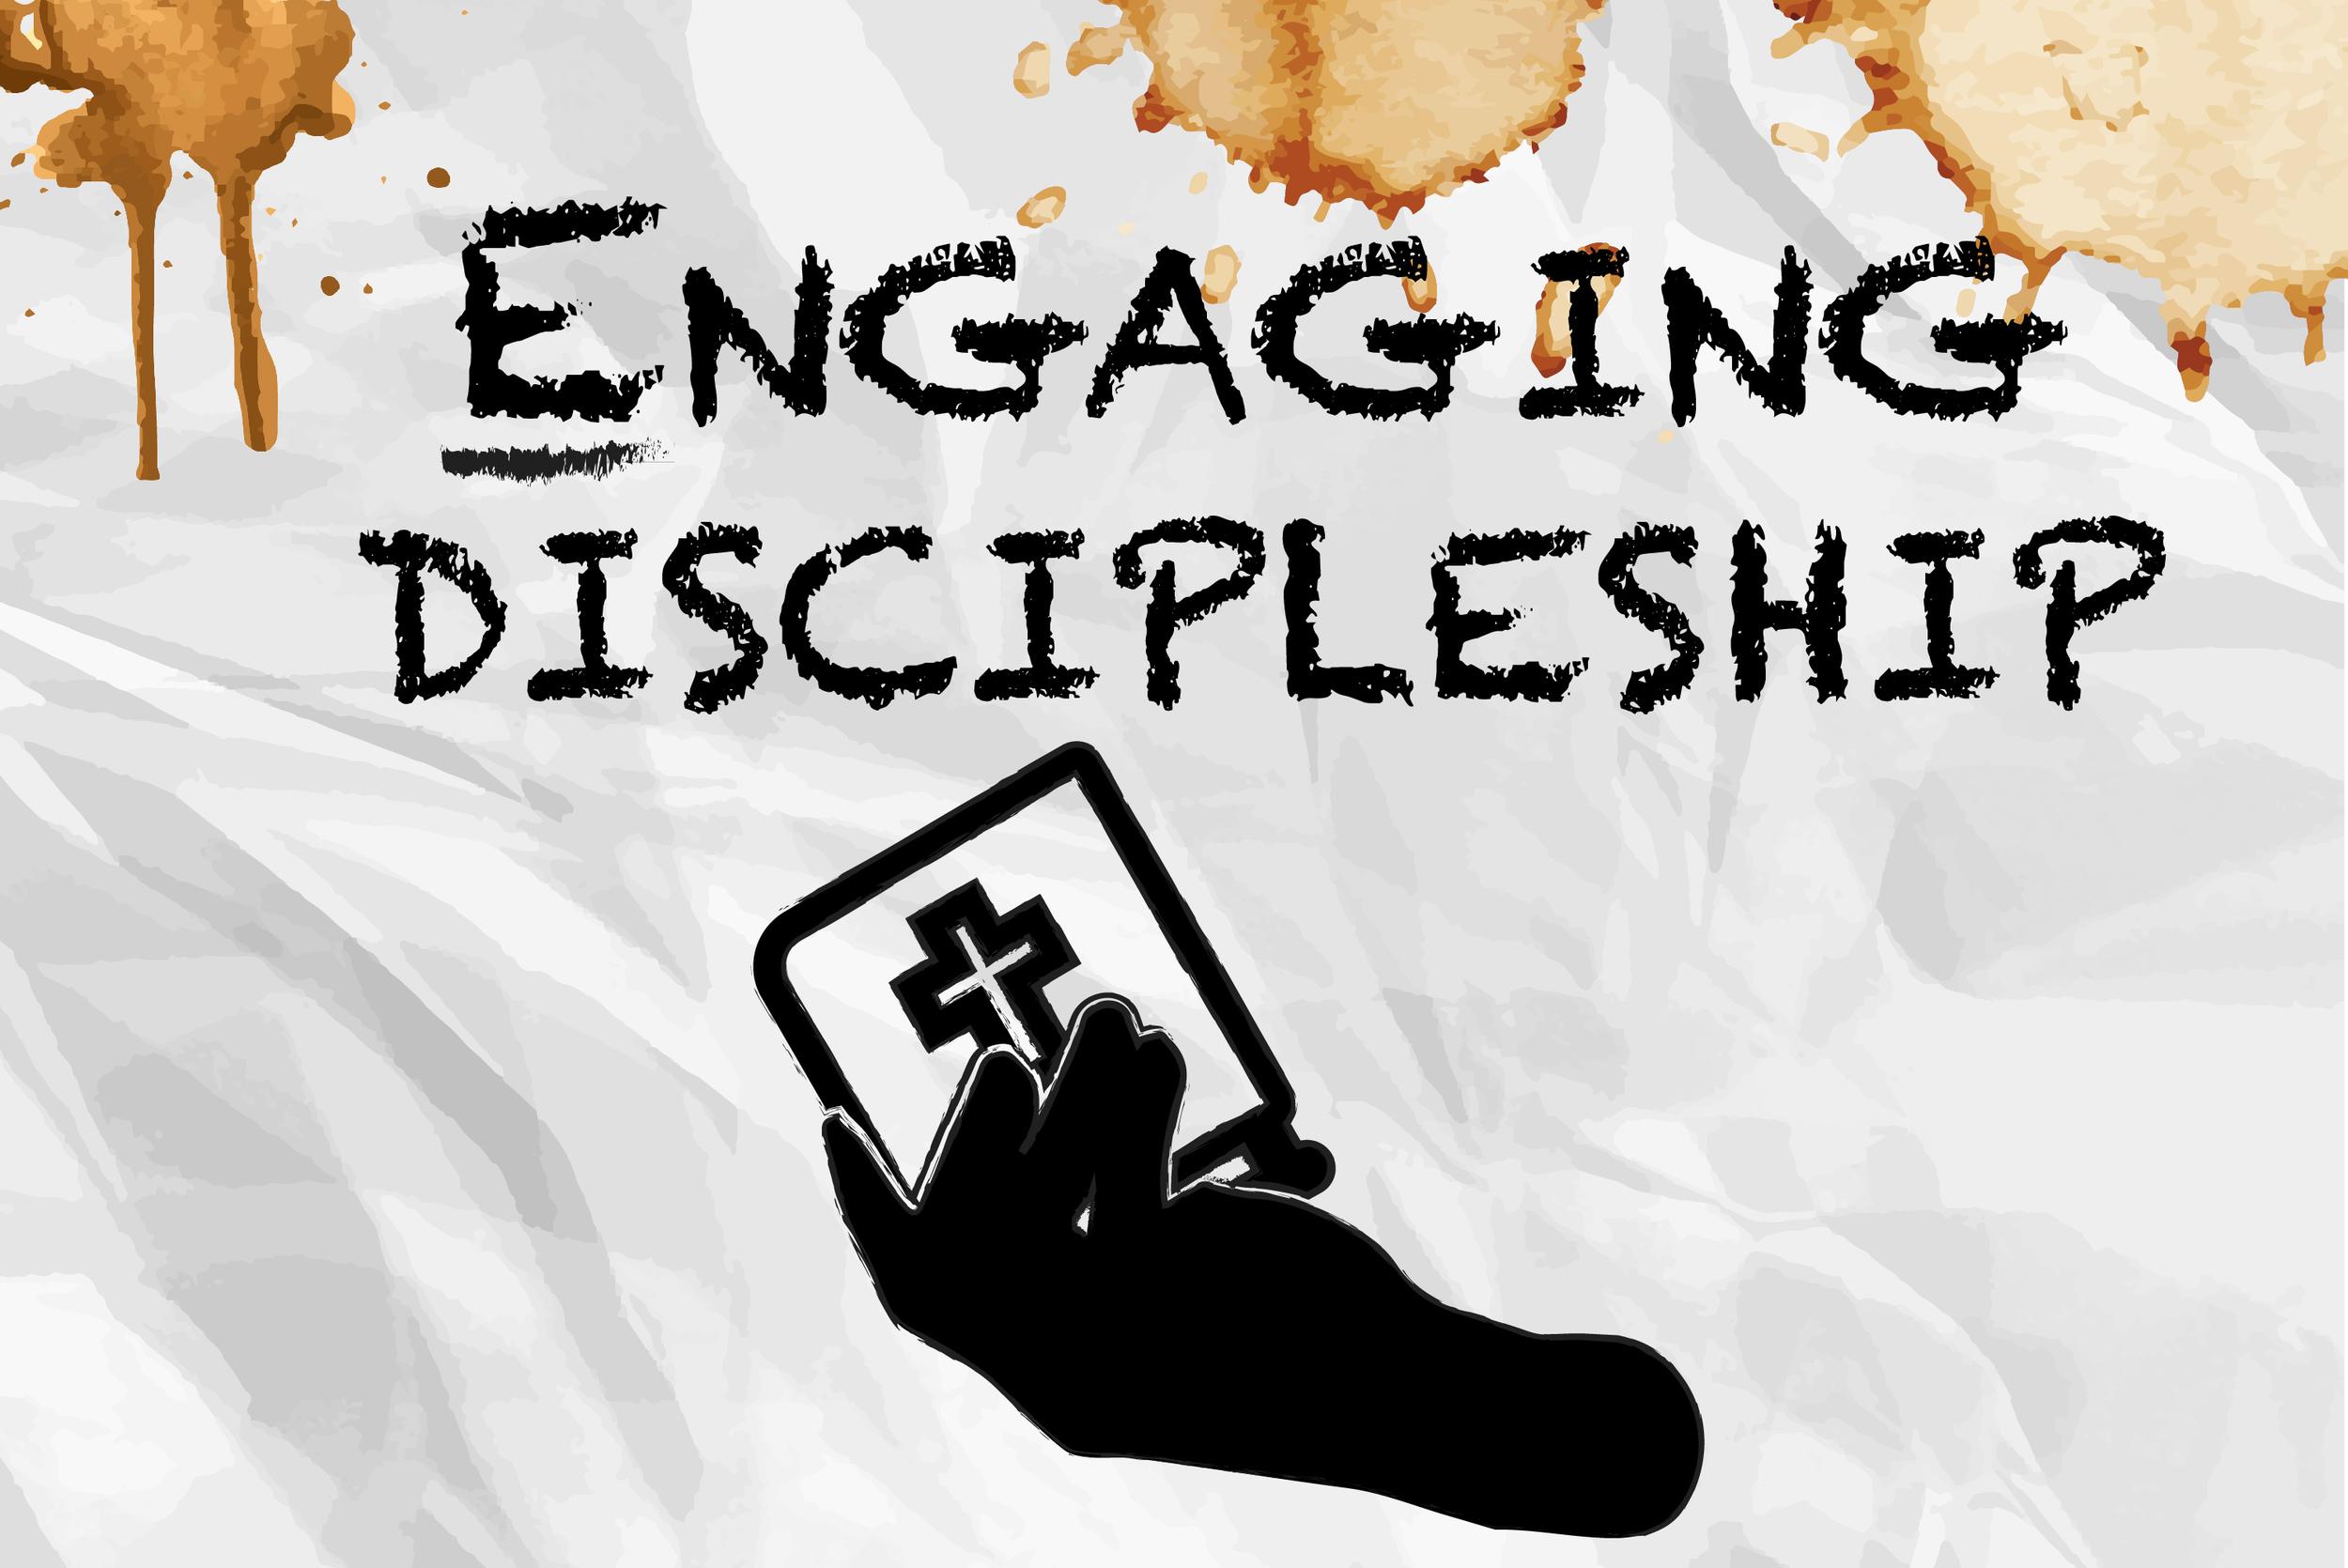 Engaging Discipleship